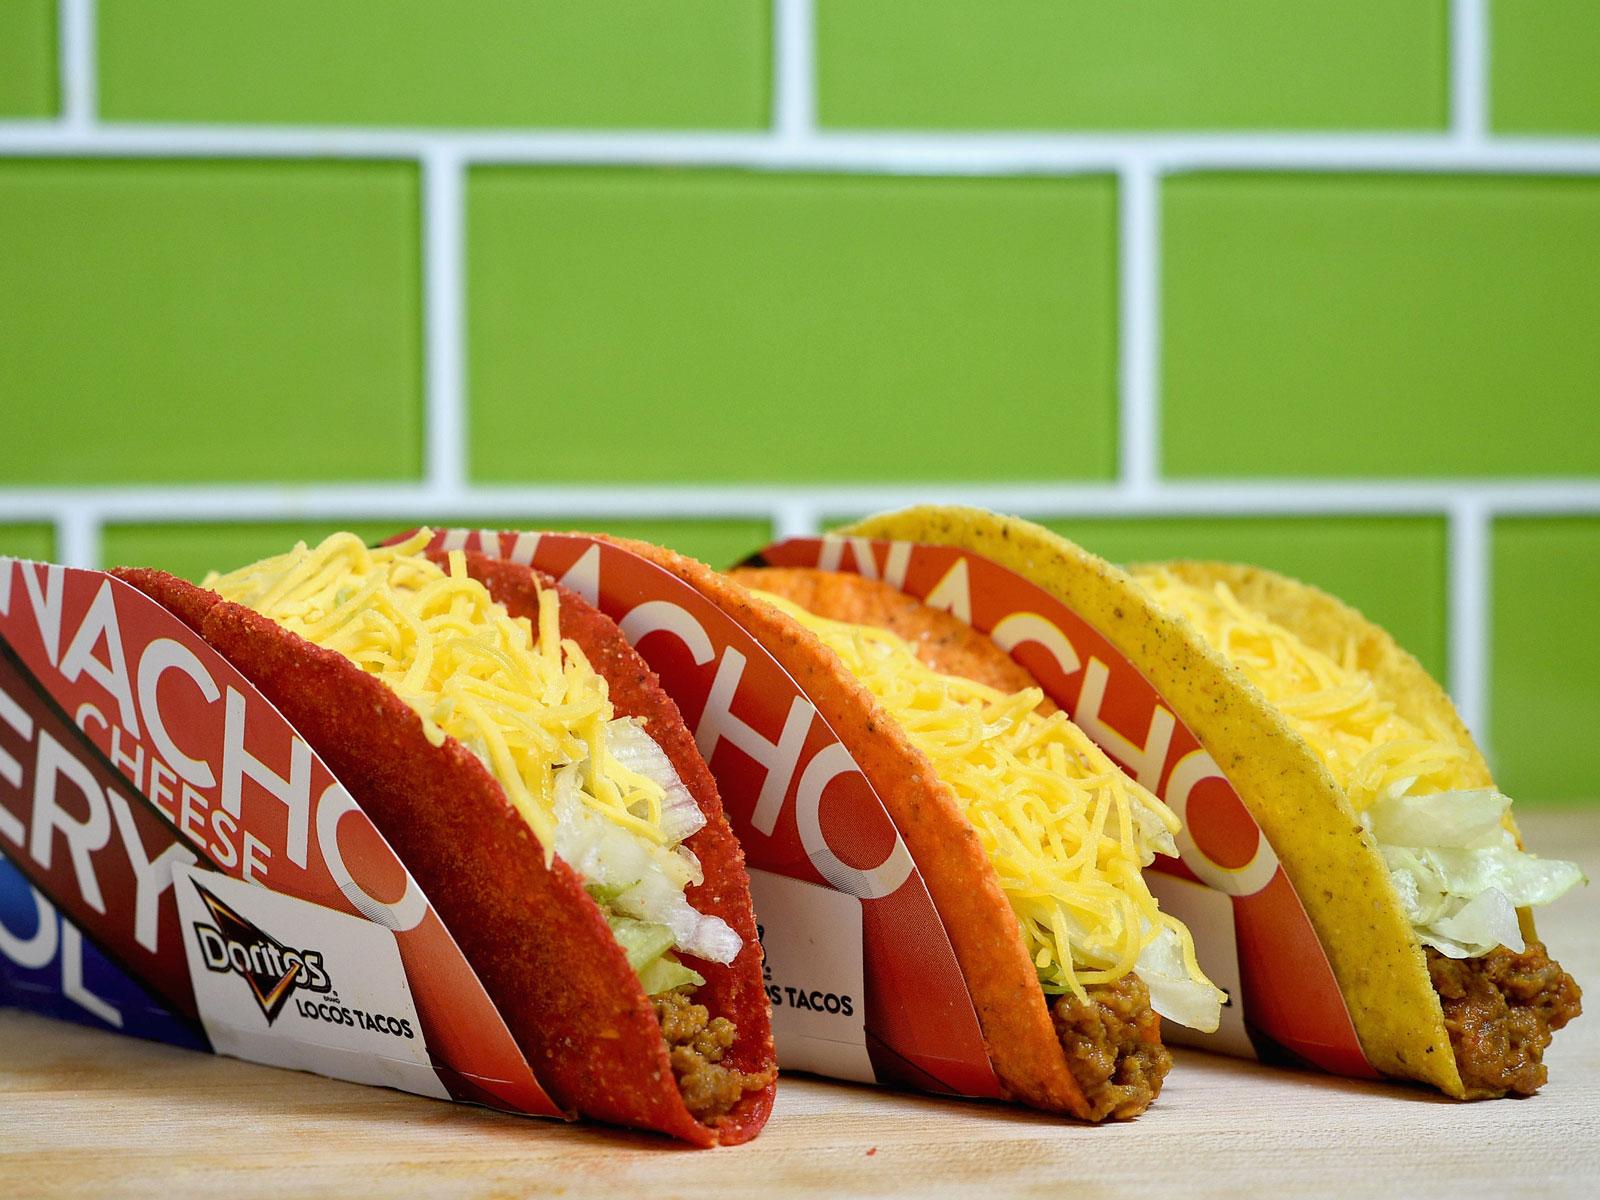 Taco Bell Will Ax Nine Items in Menu Revamp